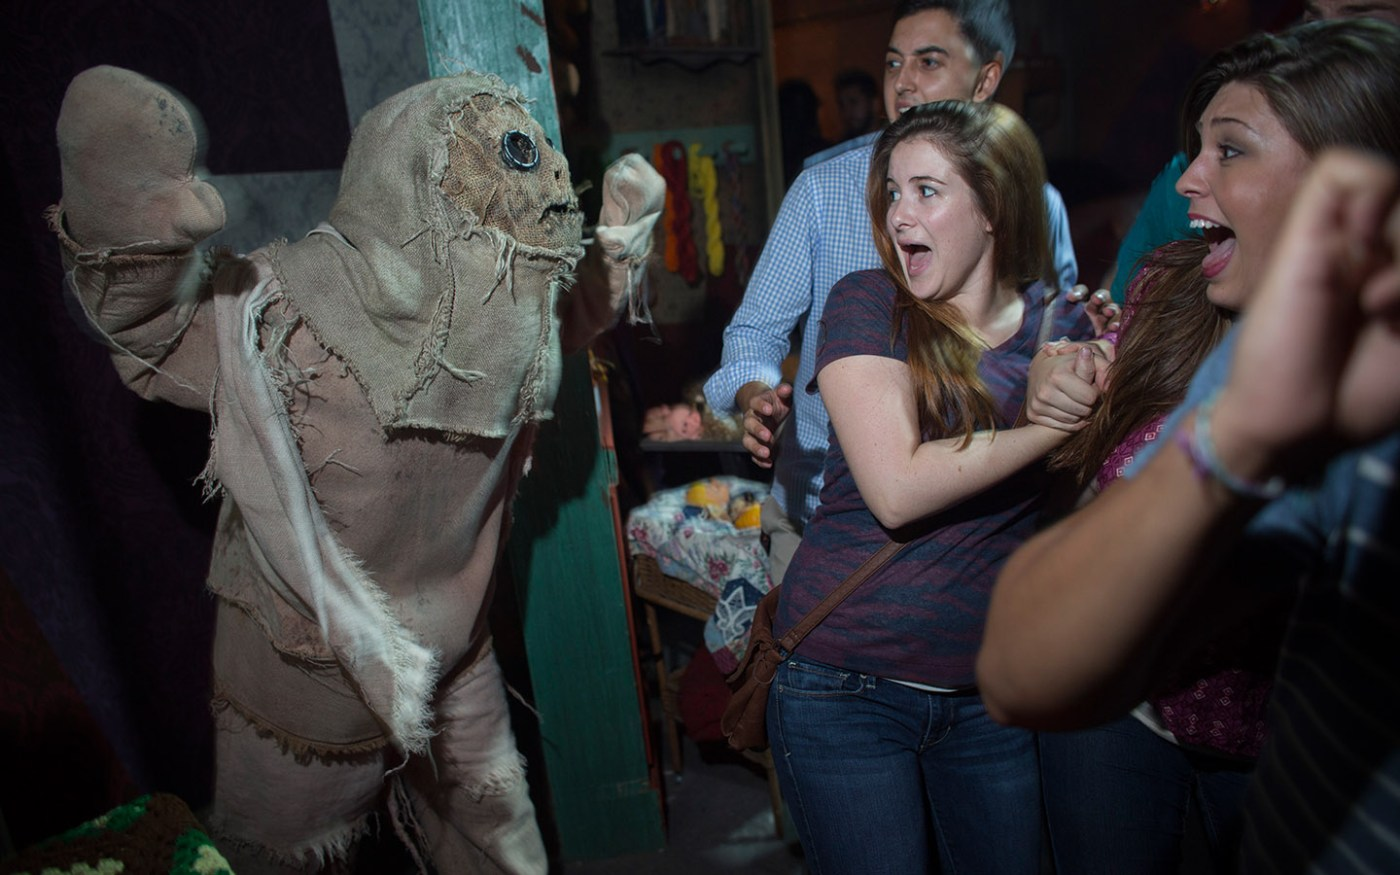 Universal Orlando's Halloween Horror Nights Haunted Houses